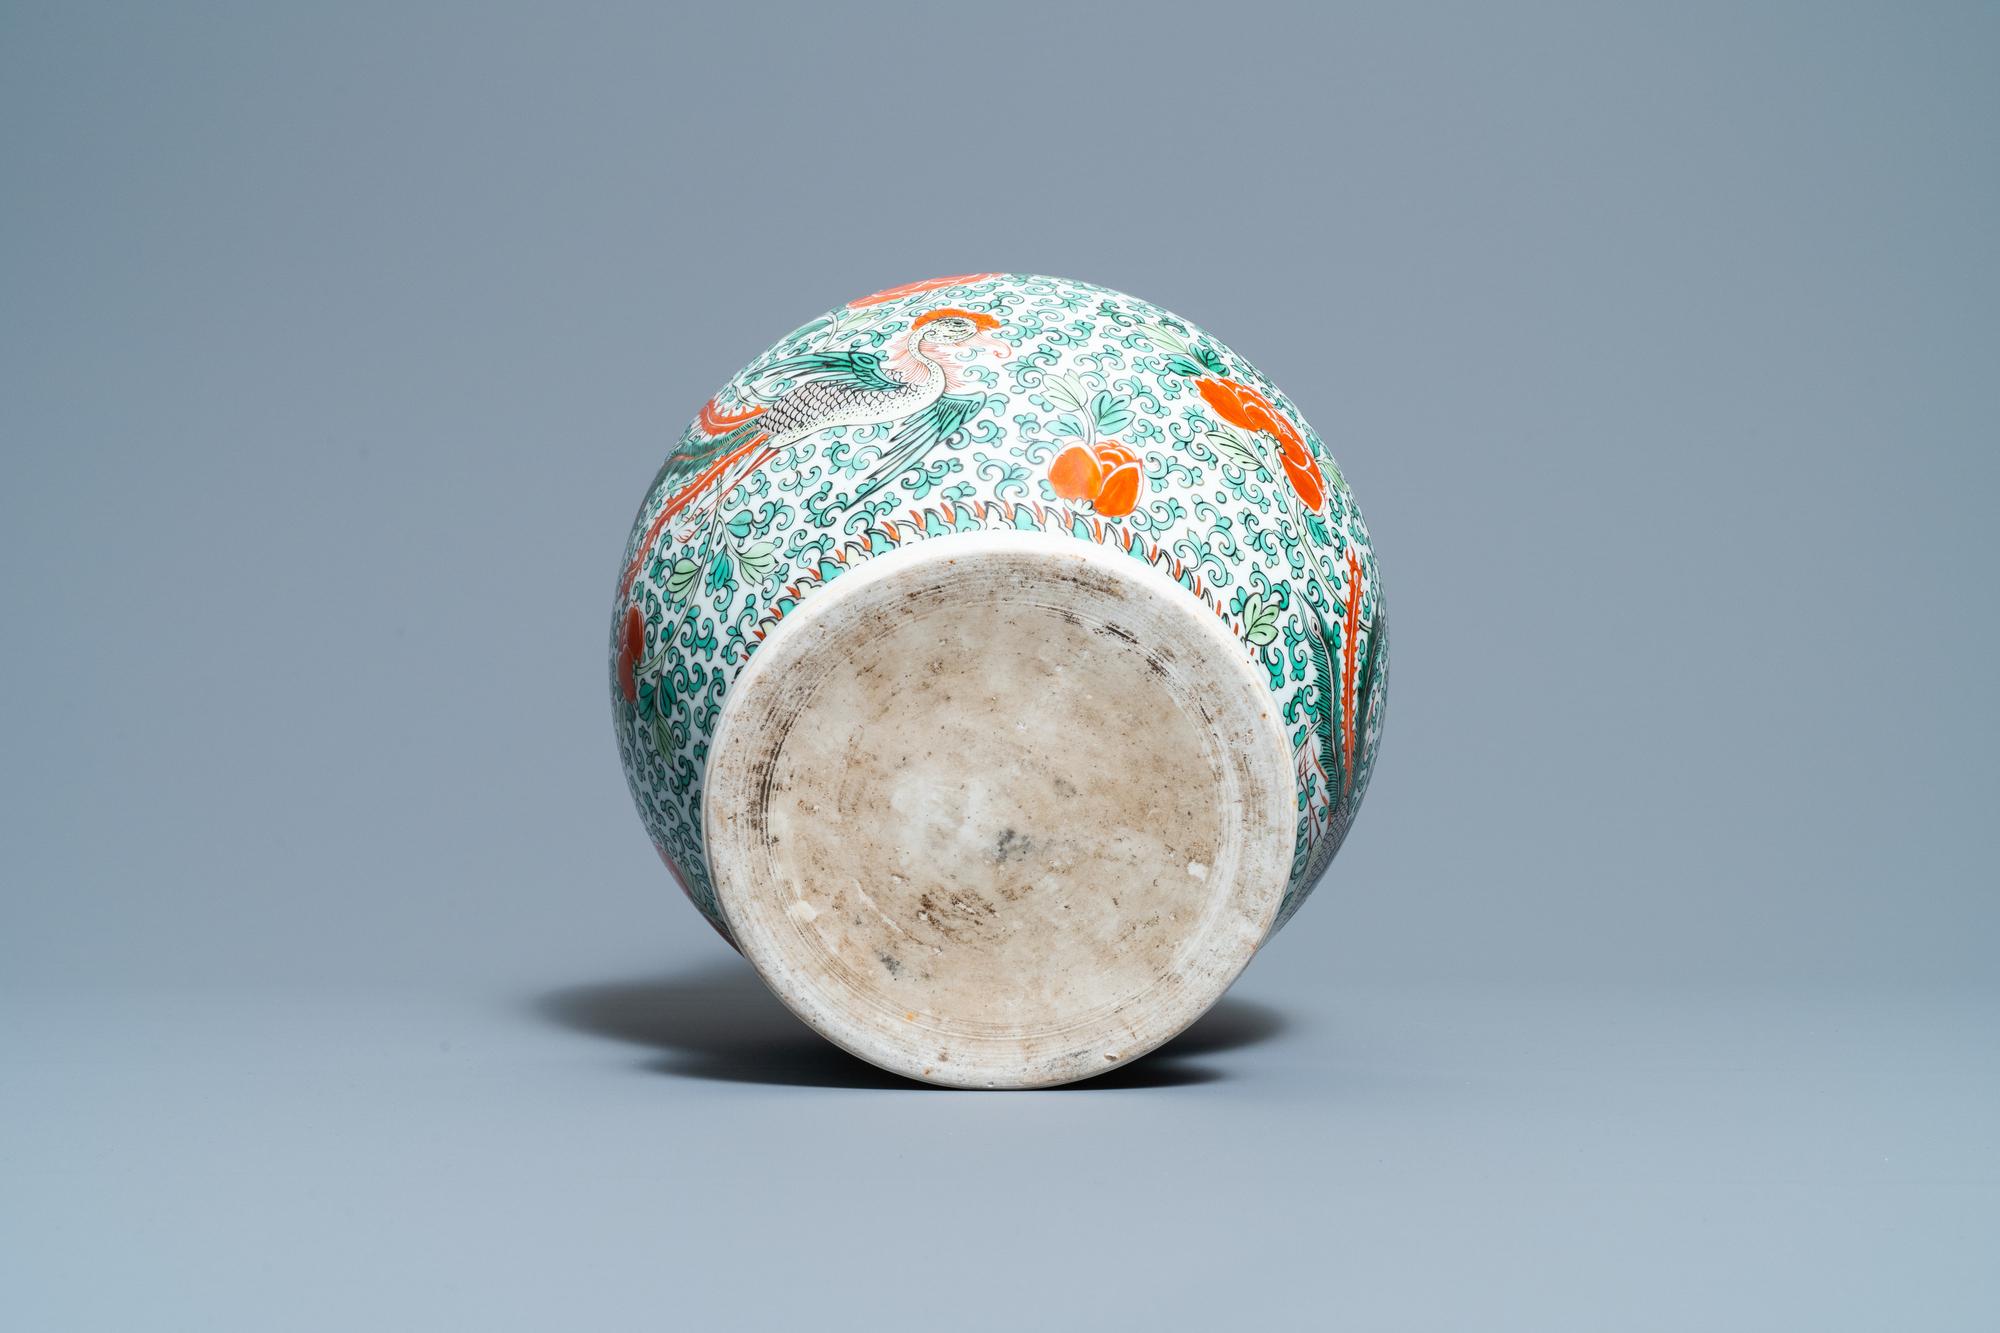 A Chinese 'wucai' phoenix vase, Chenghua mark, 19th C. - Image 6 of 6